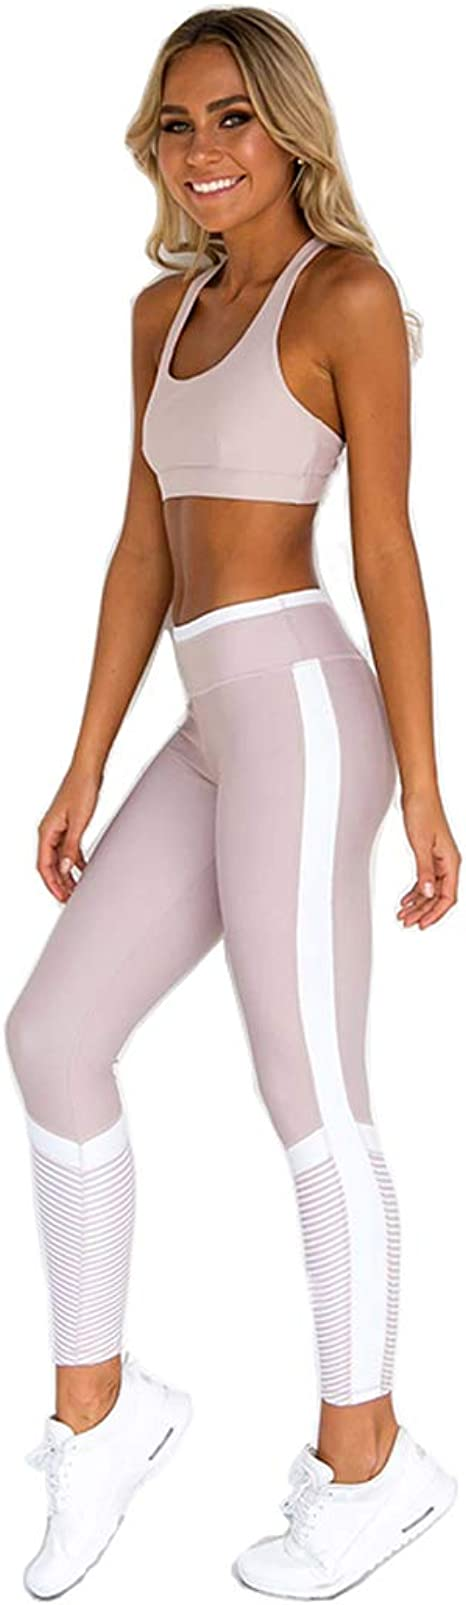 Hanwe Womens Bra Yoga Pants Workout Running Bras Gym Yoga Leggings High Waist Butt Lifting Pant by Hanwe